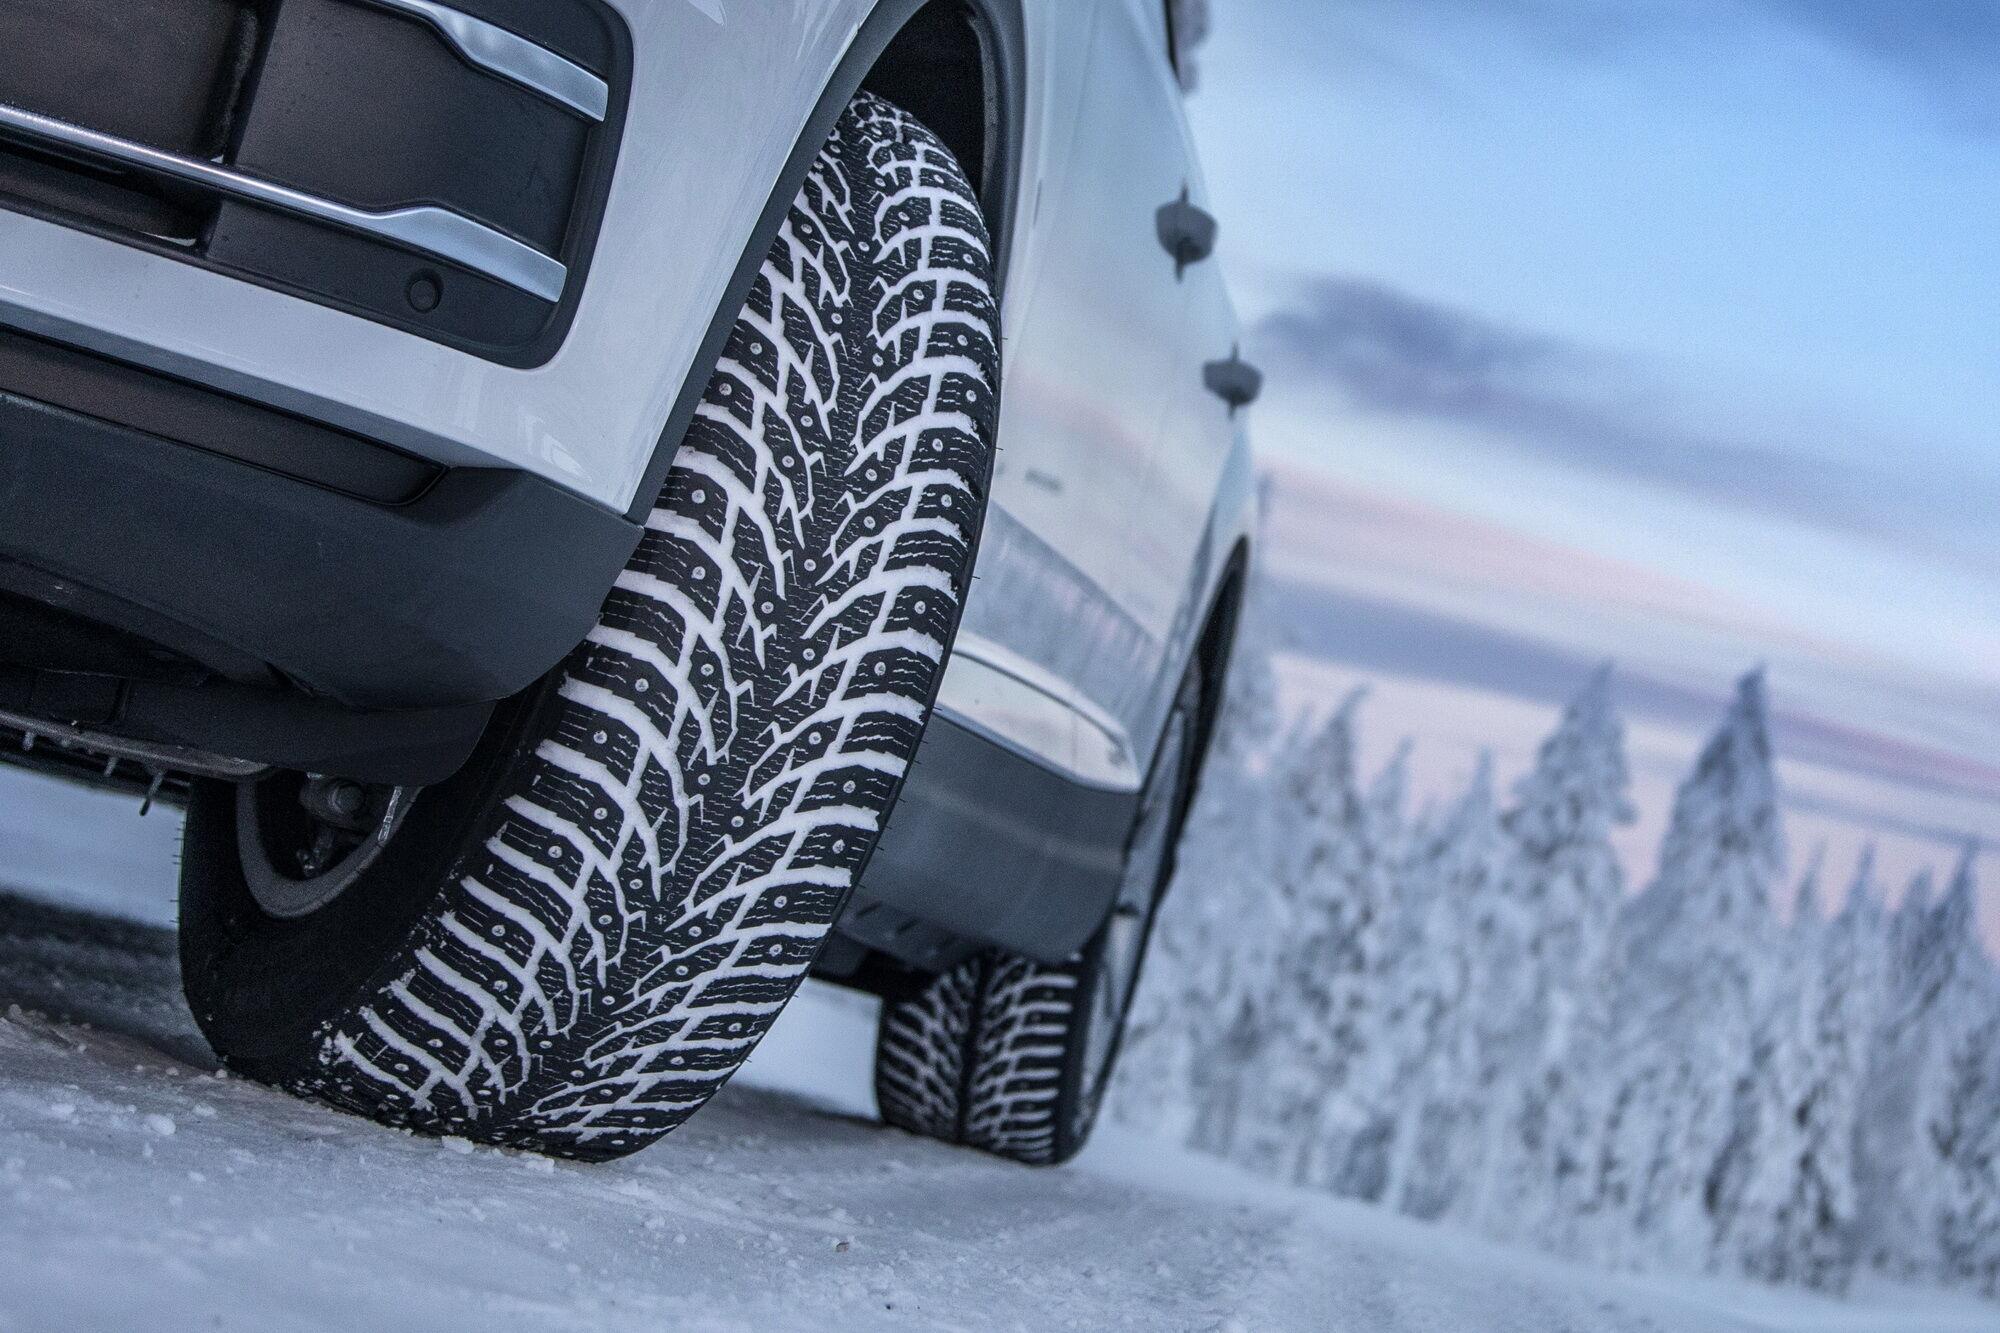 Nokian Hakkapeliitta 9 SUV представлена в 78 типоразмерах от 16 до 22 дюймов и имеет скоростной индекс T (190 км/ч)